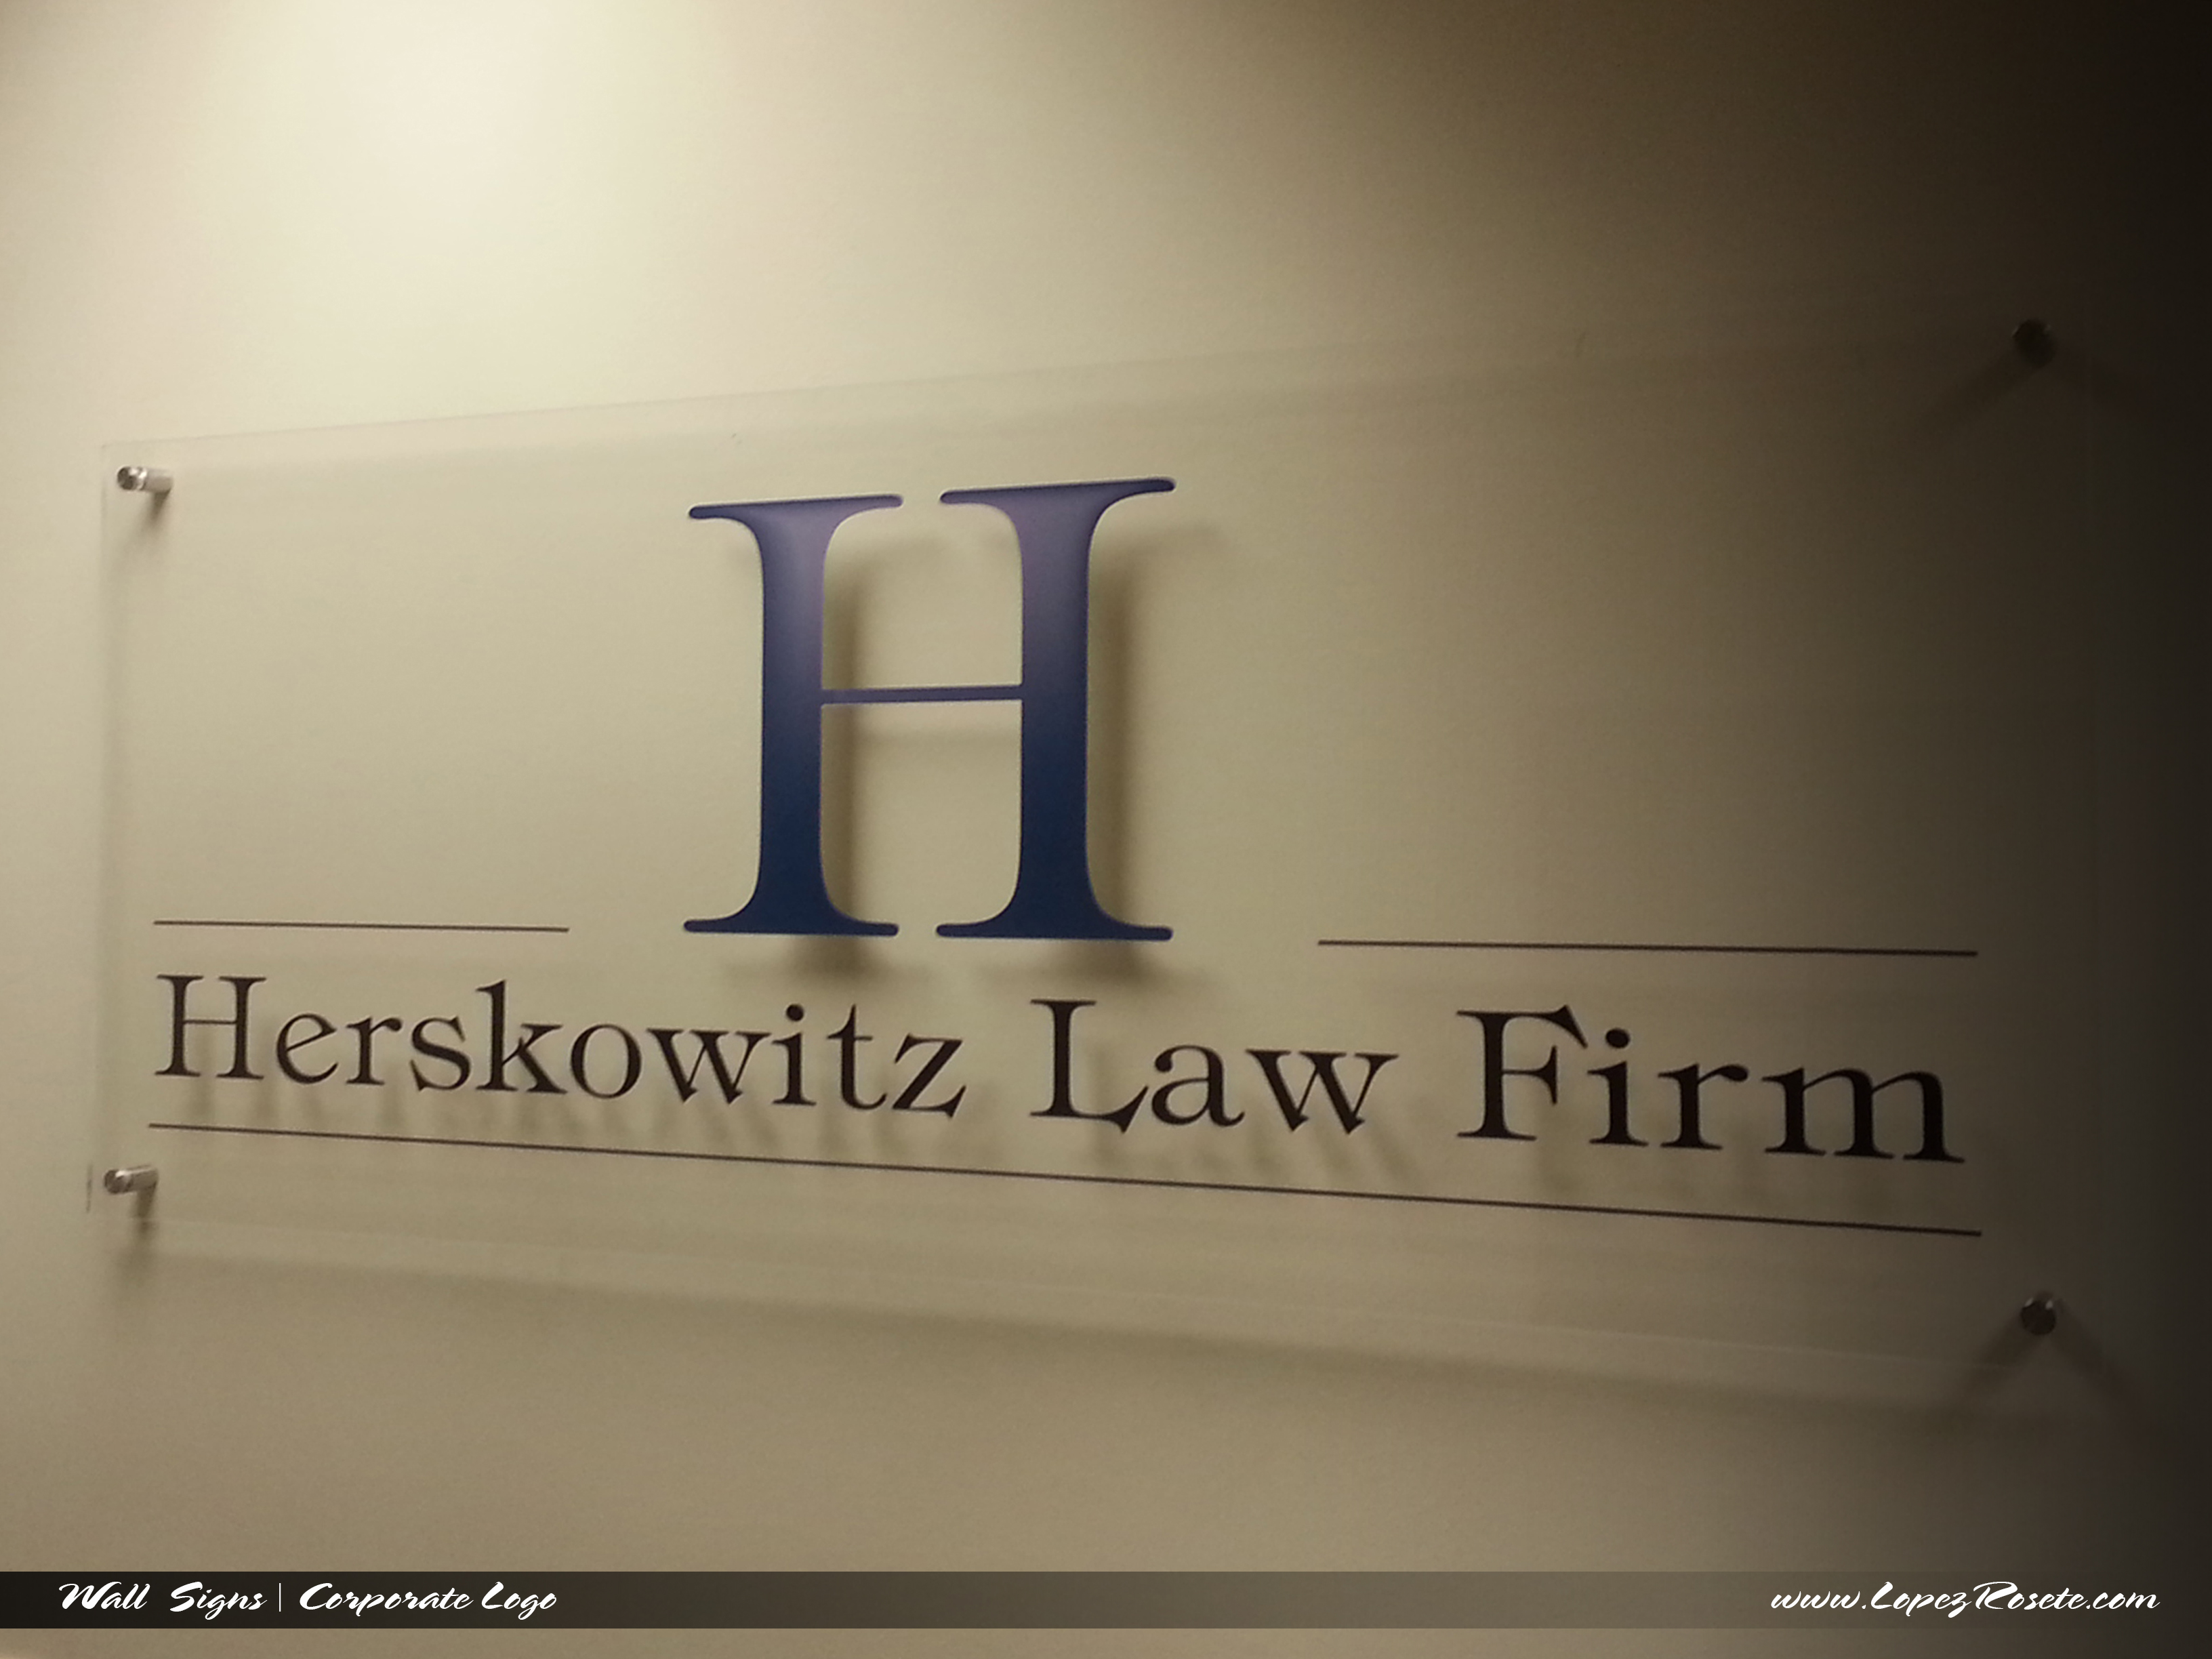 HerskowitzLawFirm